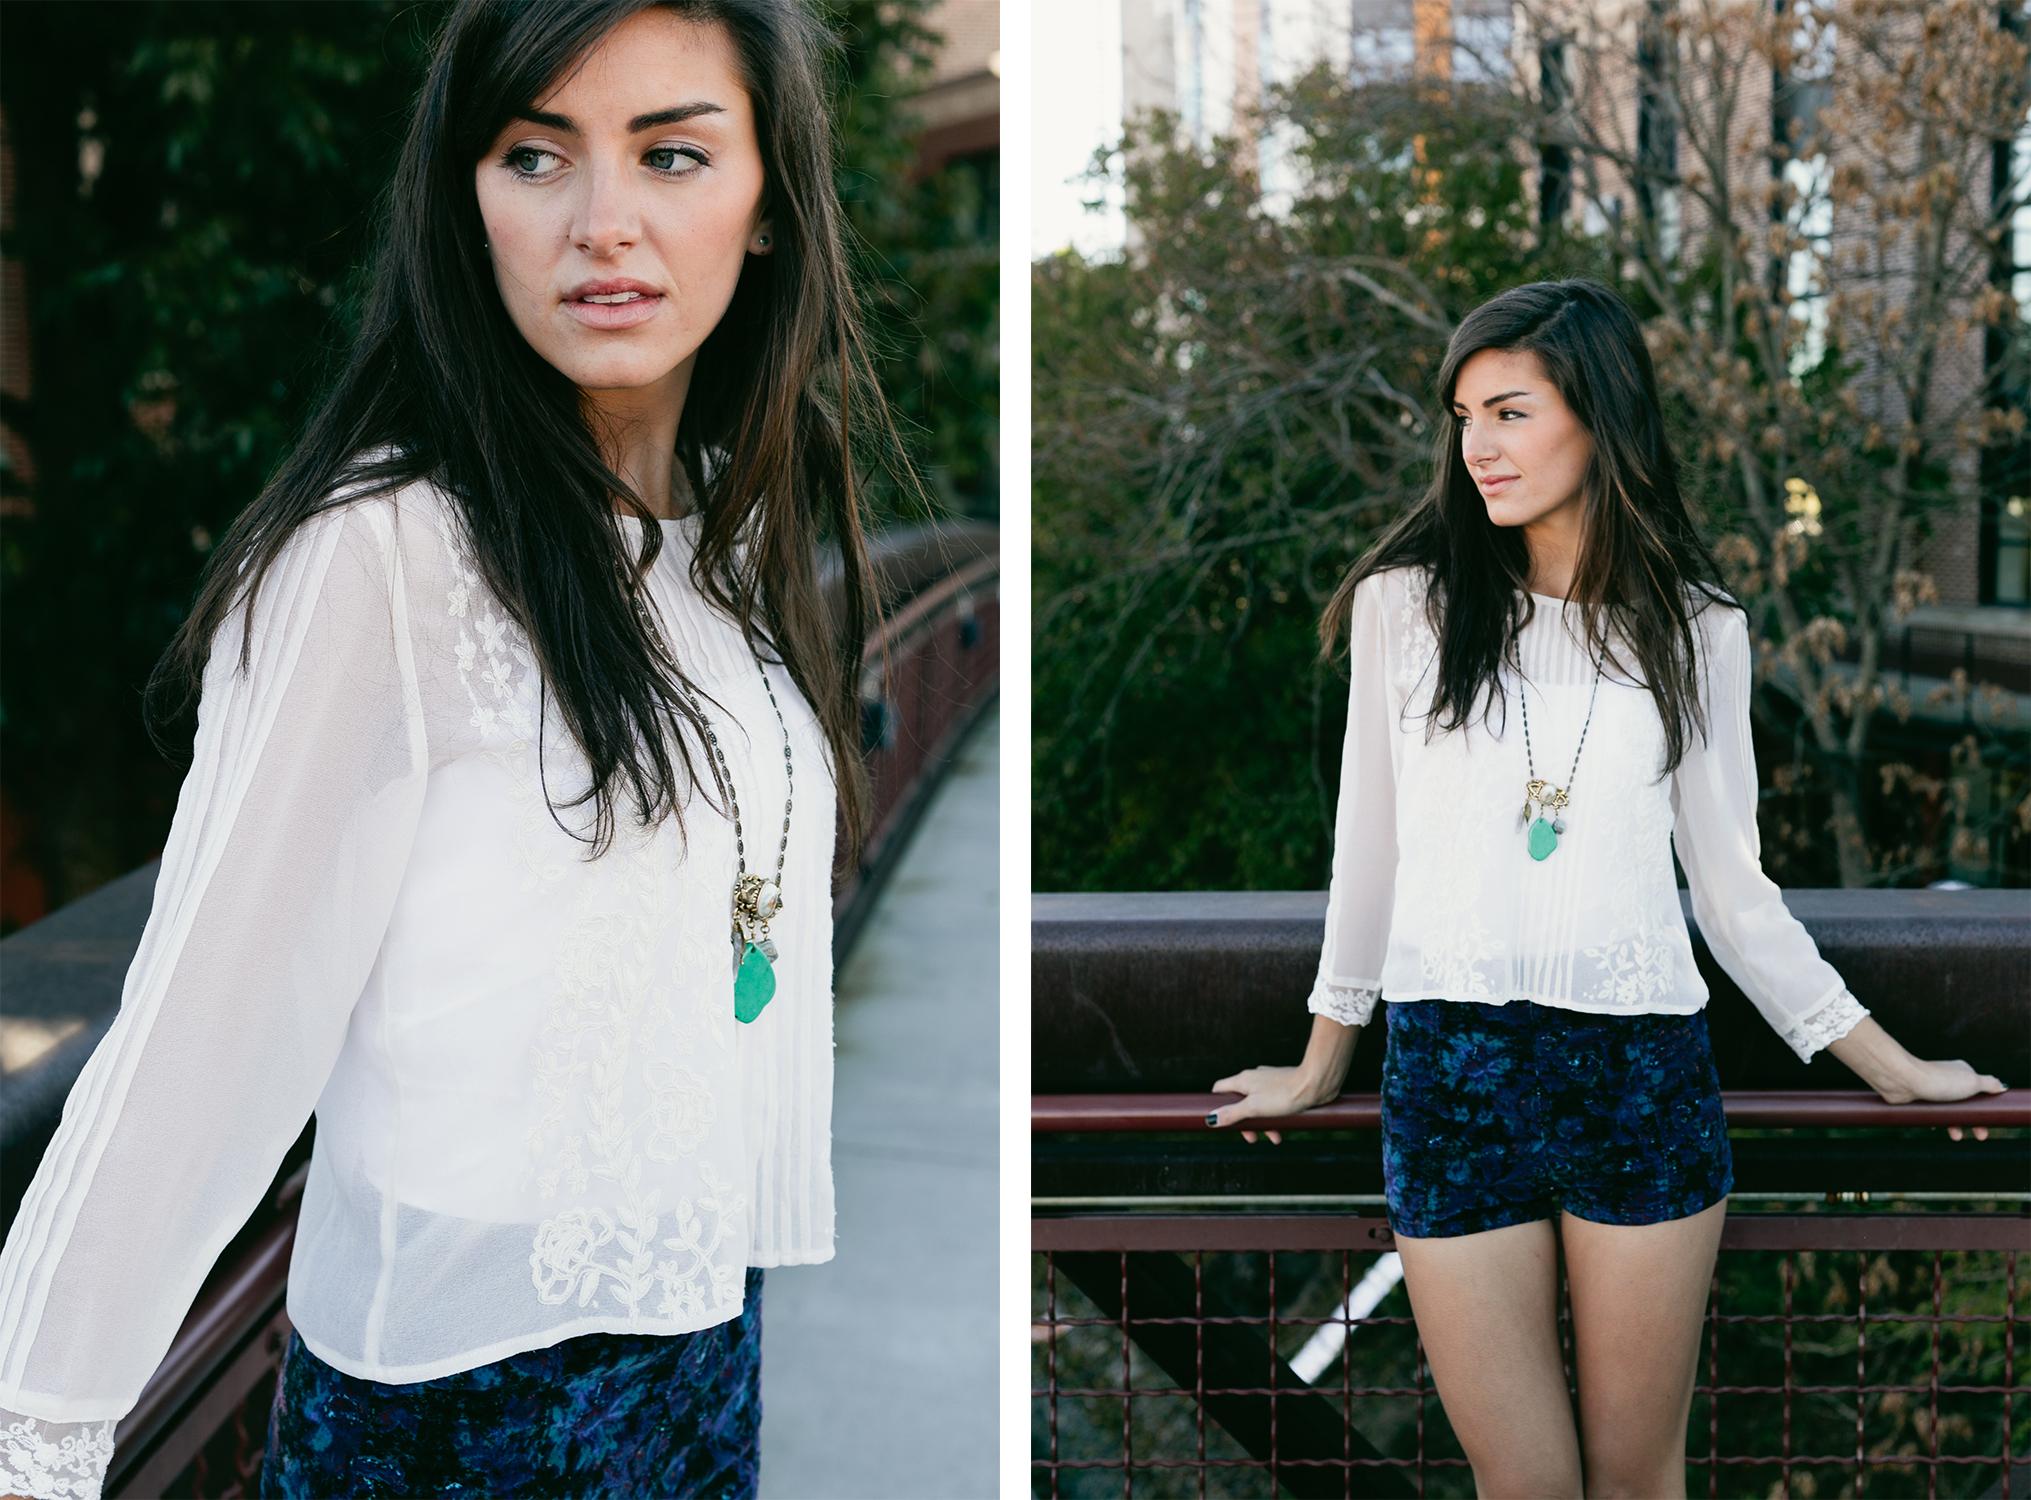 Atlanta-Fashion-Photographer-Kathryn-McCrary-Photography-Fahion-Style-Up-Collage1.jpg